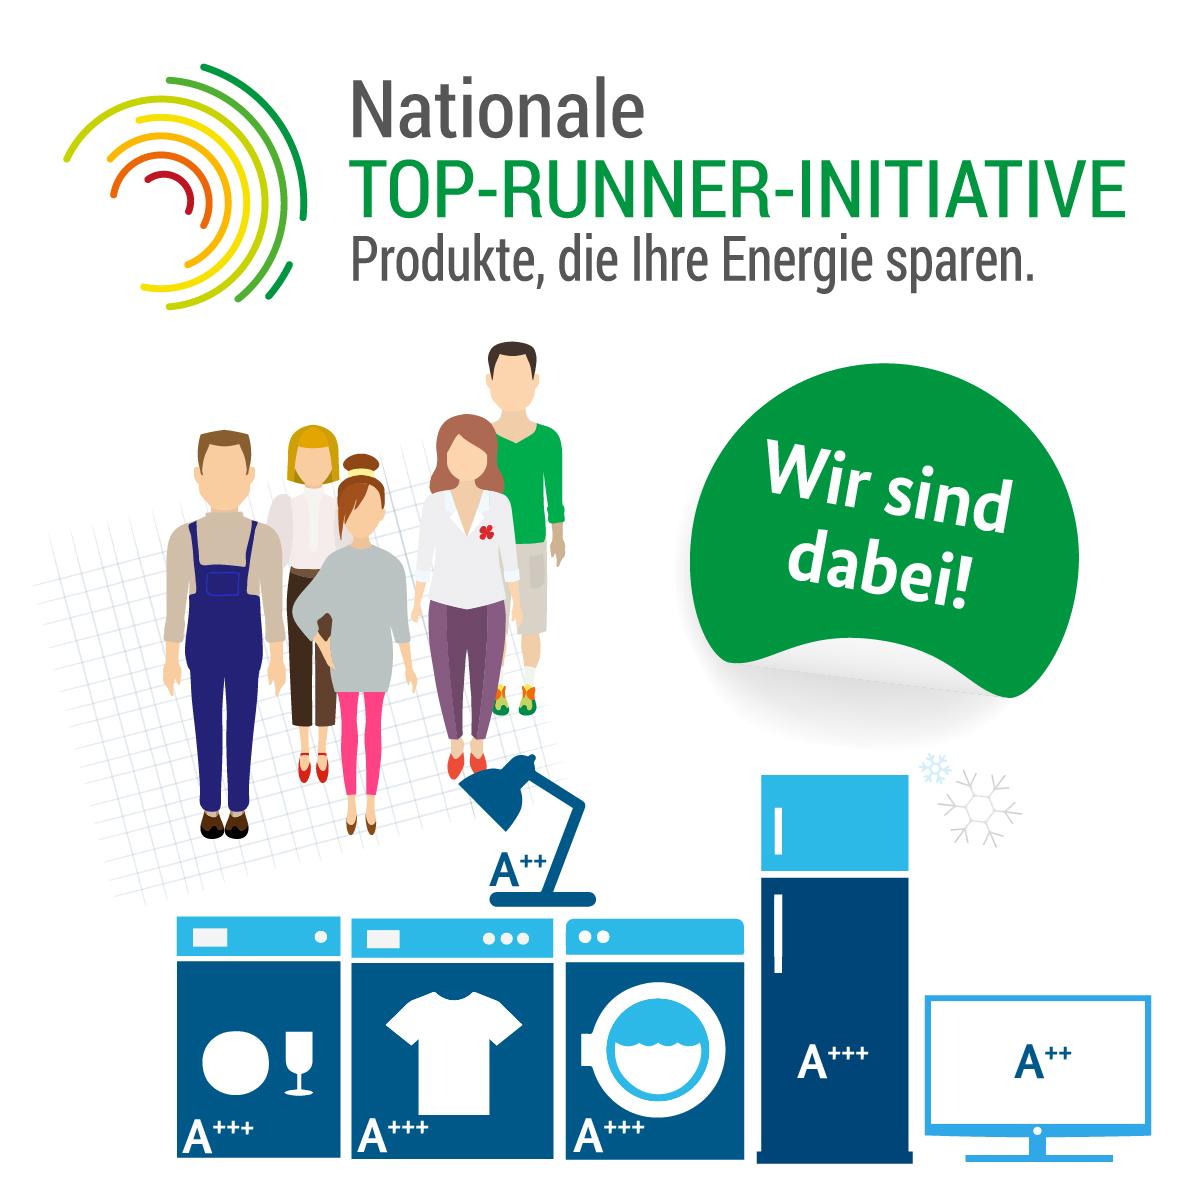 Nationale Top-Runner-Initiative